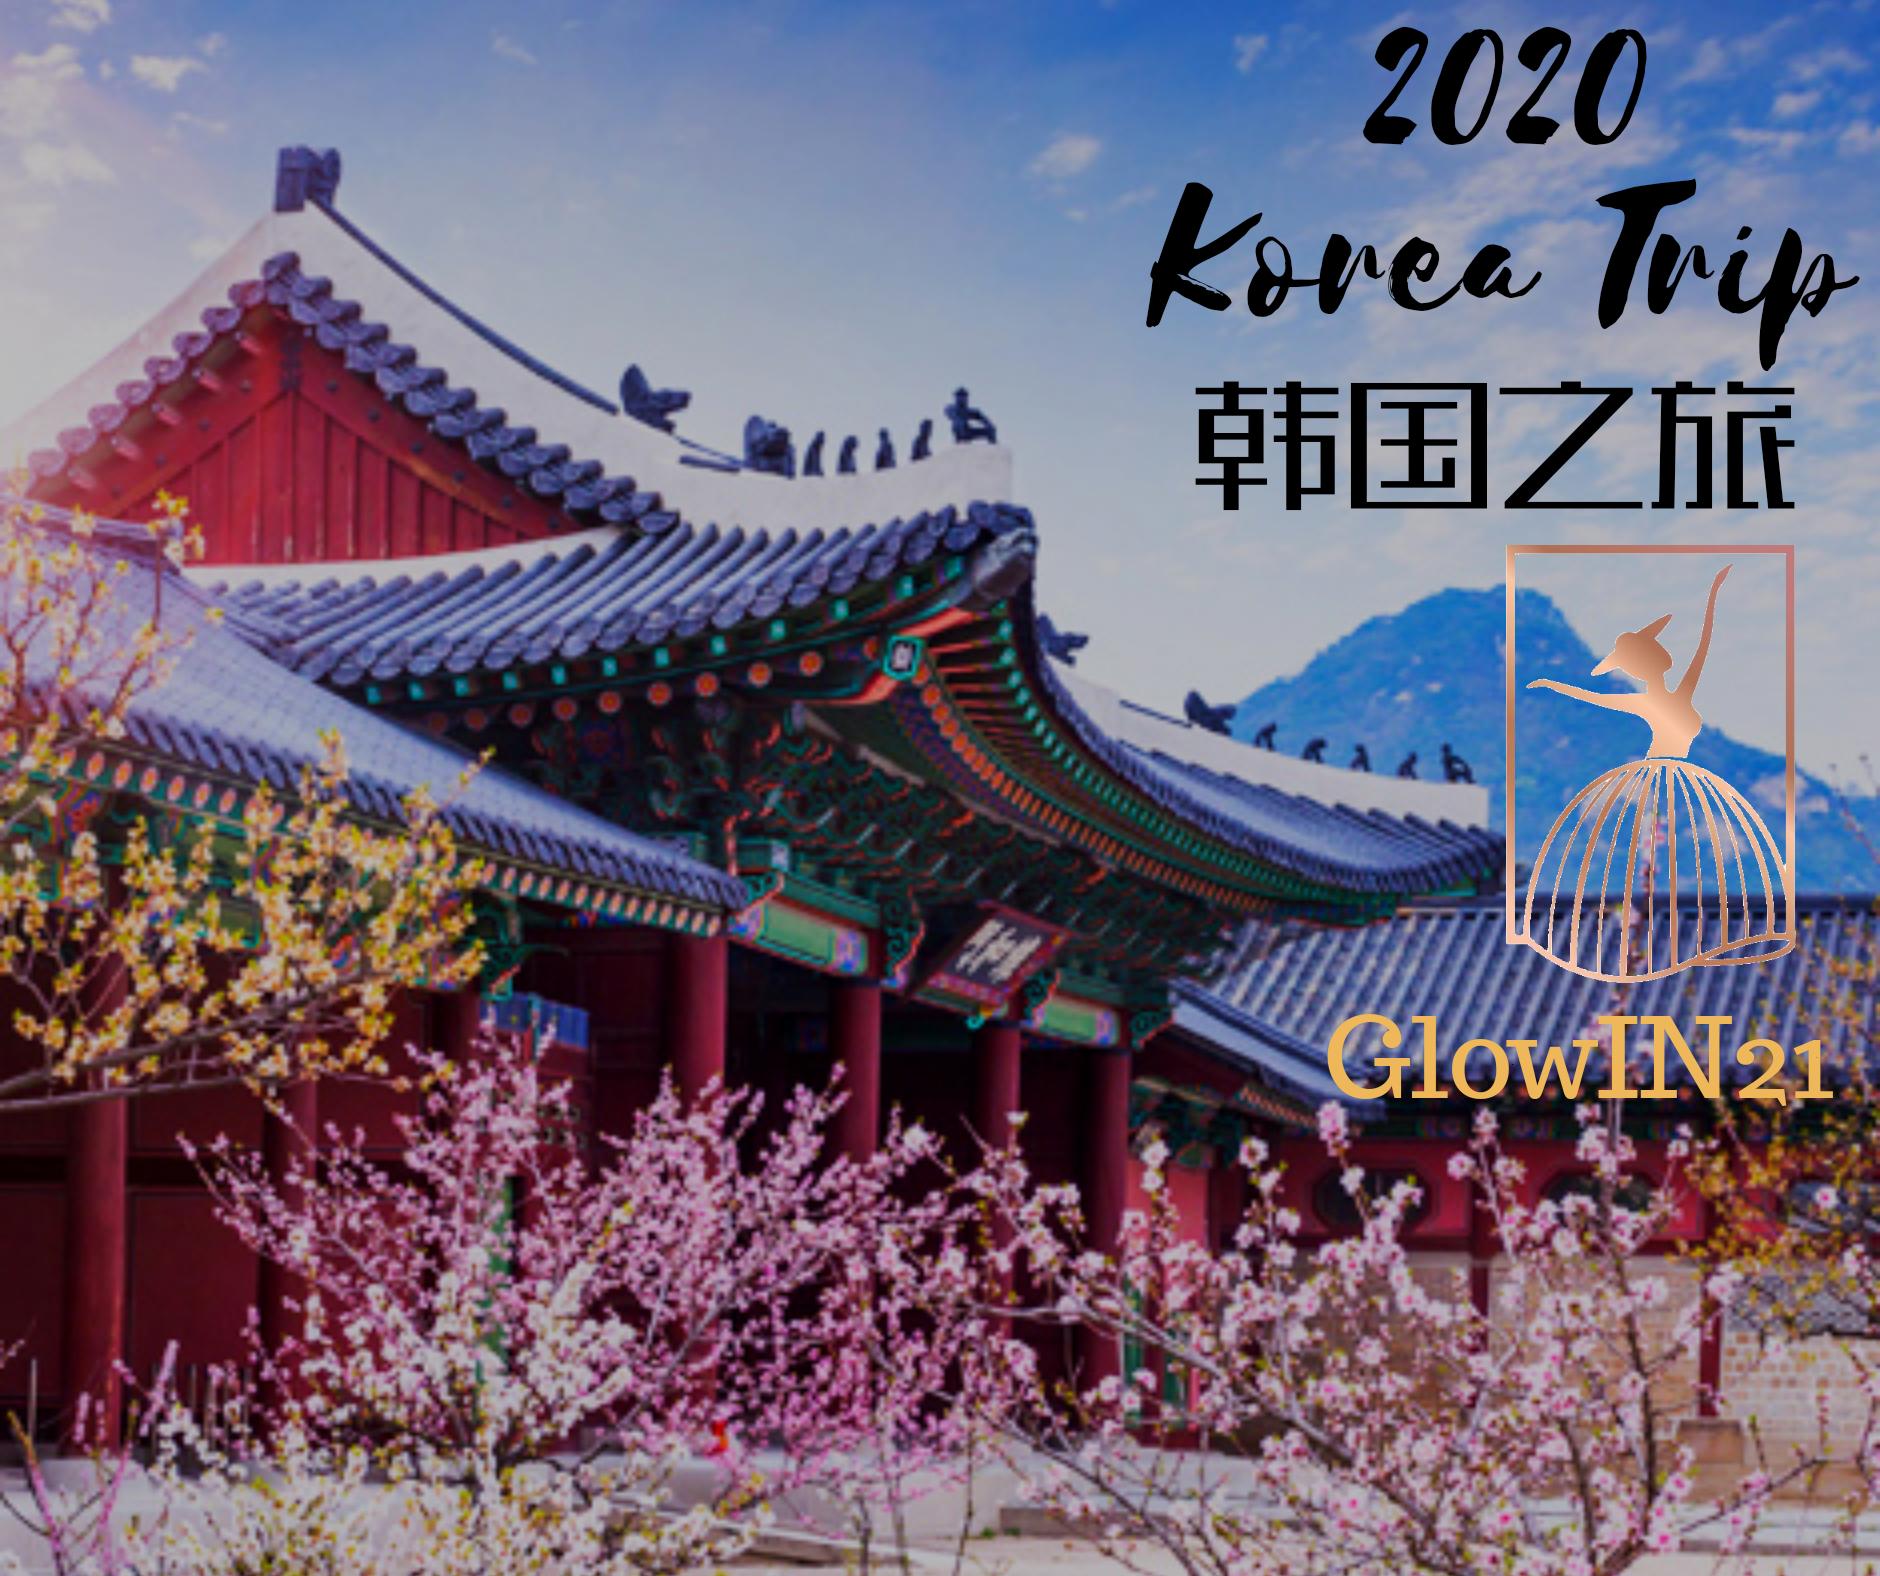 GLOWIN21 2020年度韩国团队旅游奖励